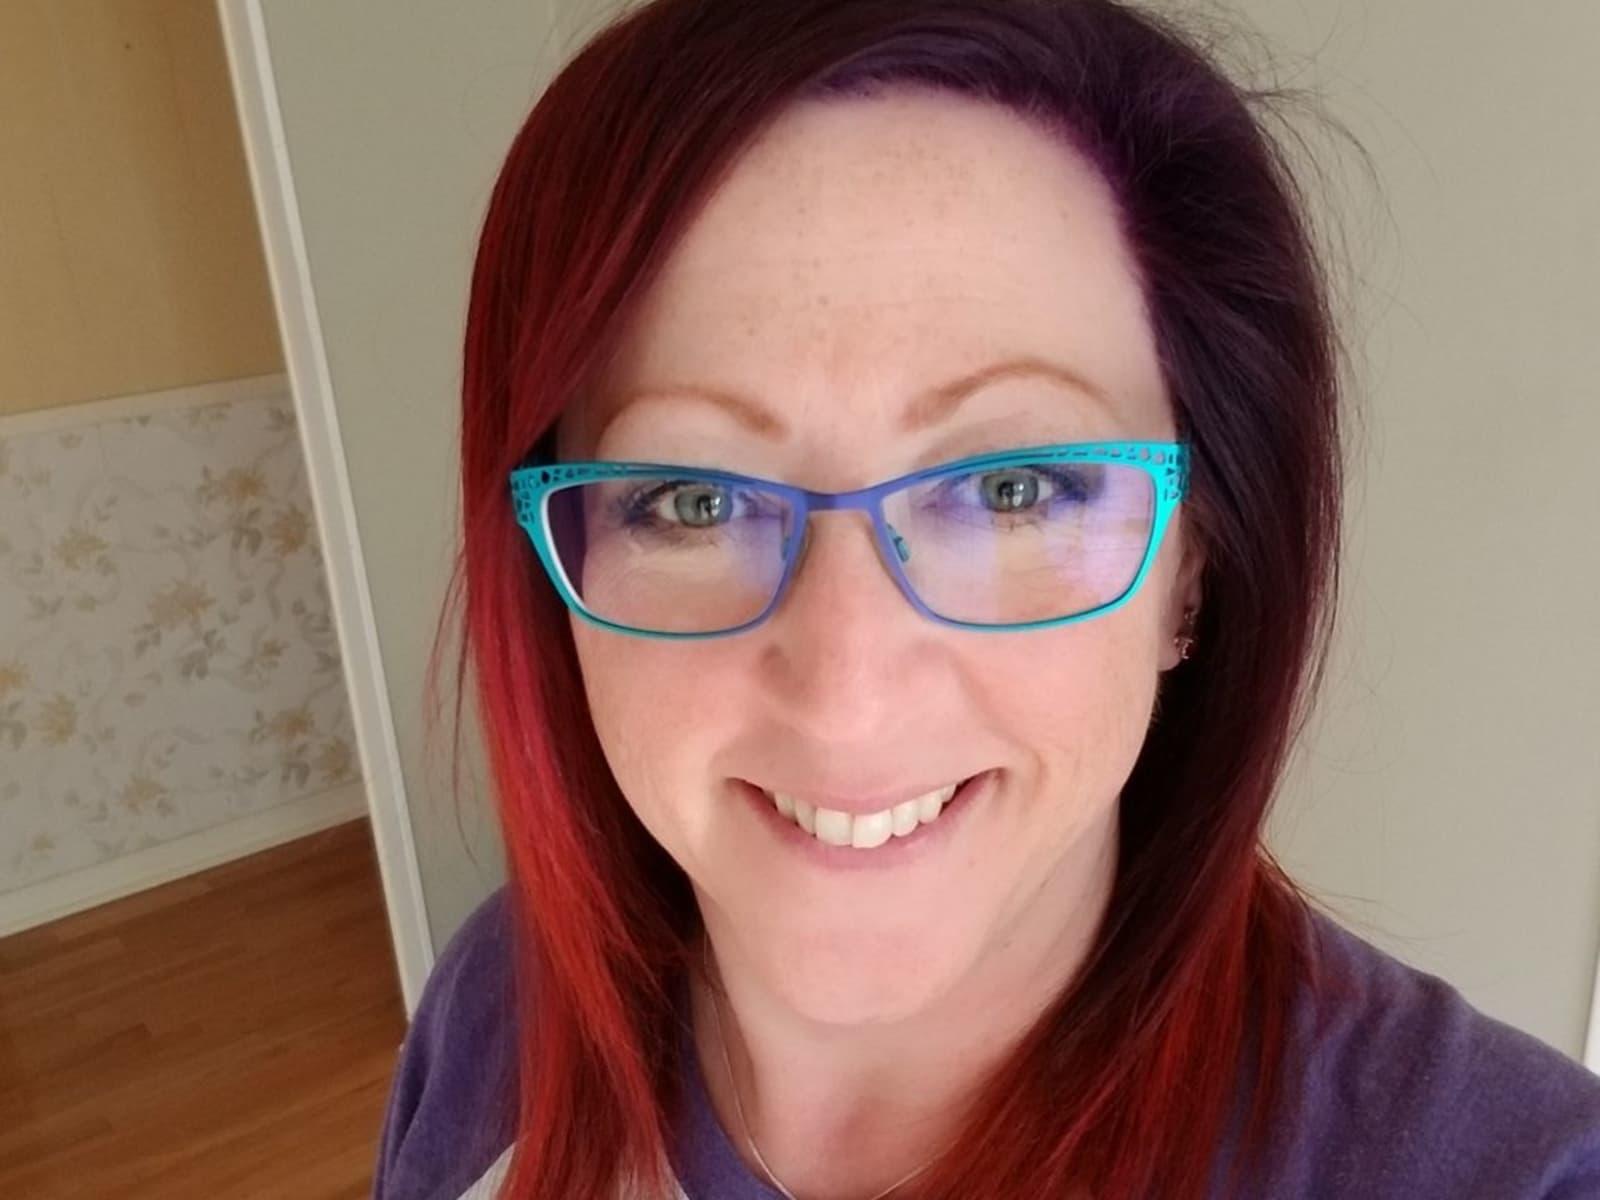 Cheryl from Toronto, Ontario, Canada